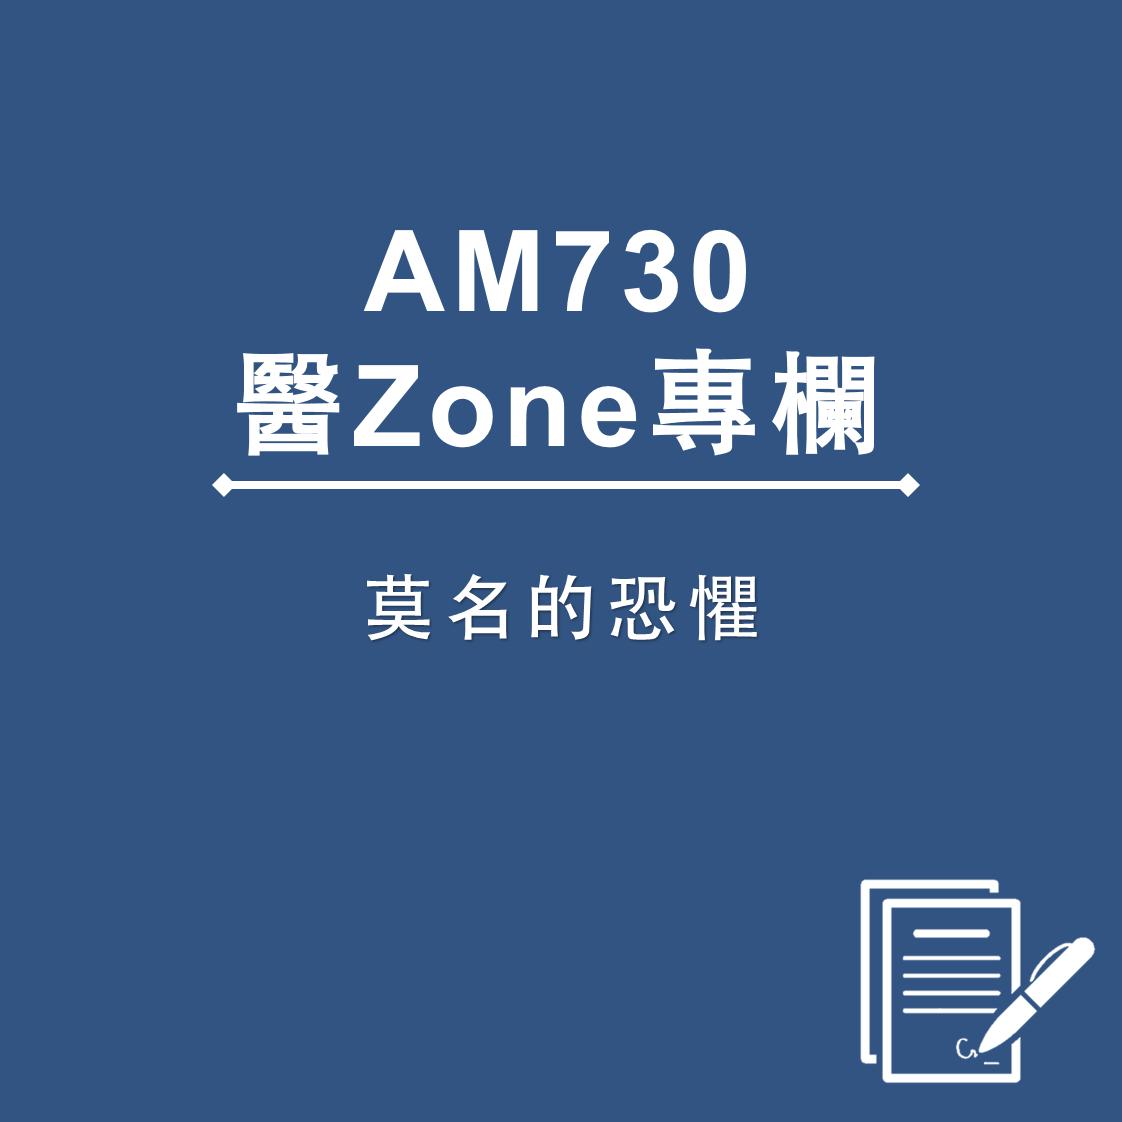 AM730 醫Zone 專欄 - 莫名的恐懼